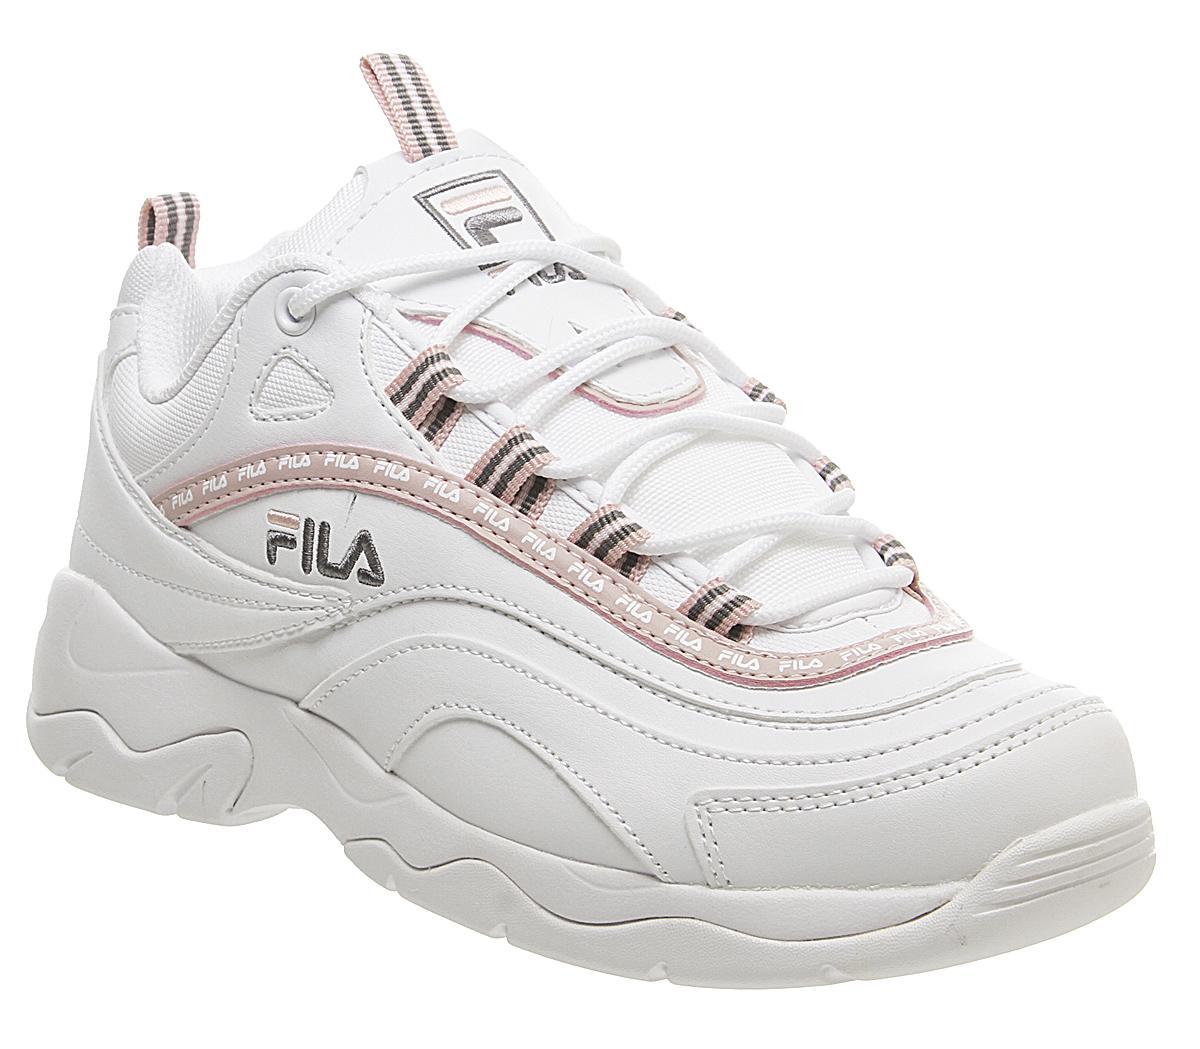 Fila Fila Ray Trainers White Chalk Pink